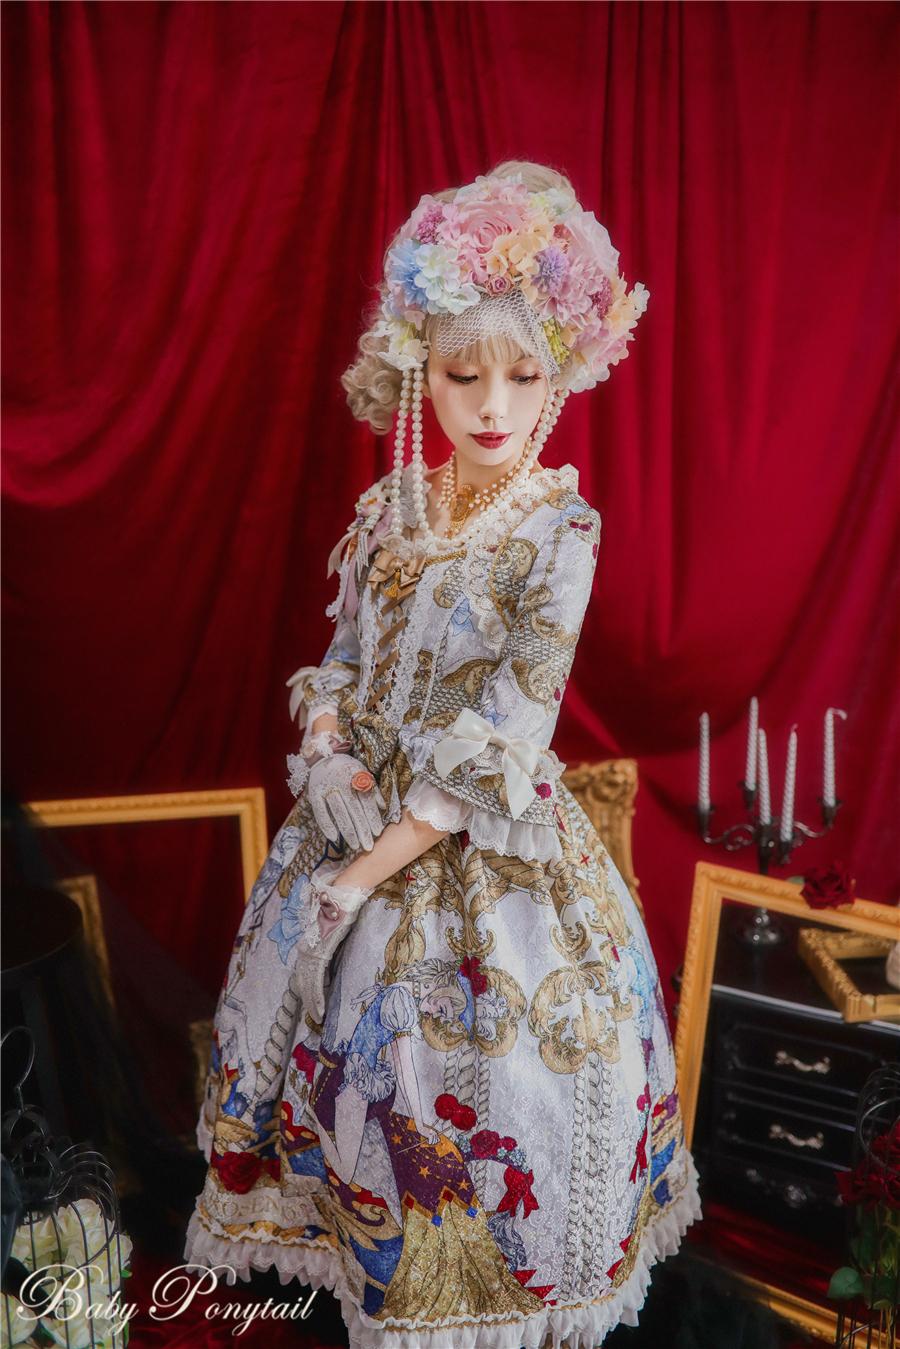 Baby Ponytail_Circus Princess_Silver OP_Kaka_14.jpg